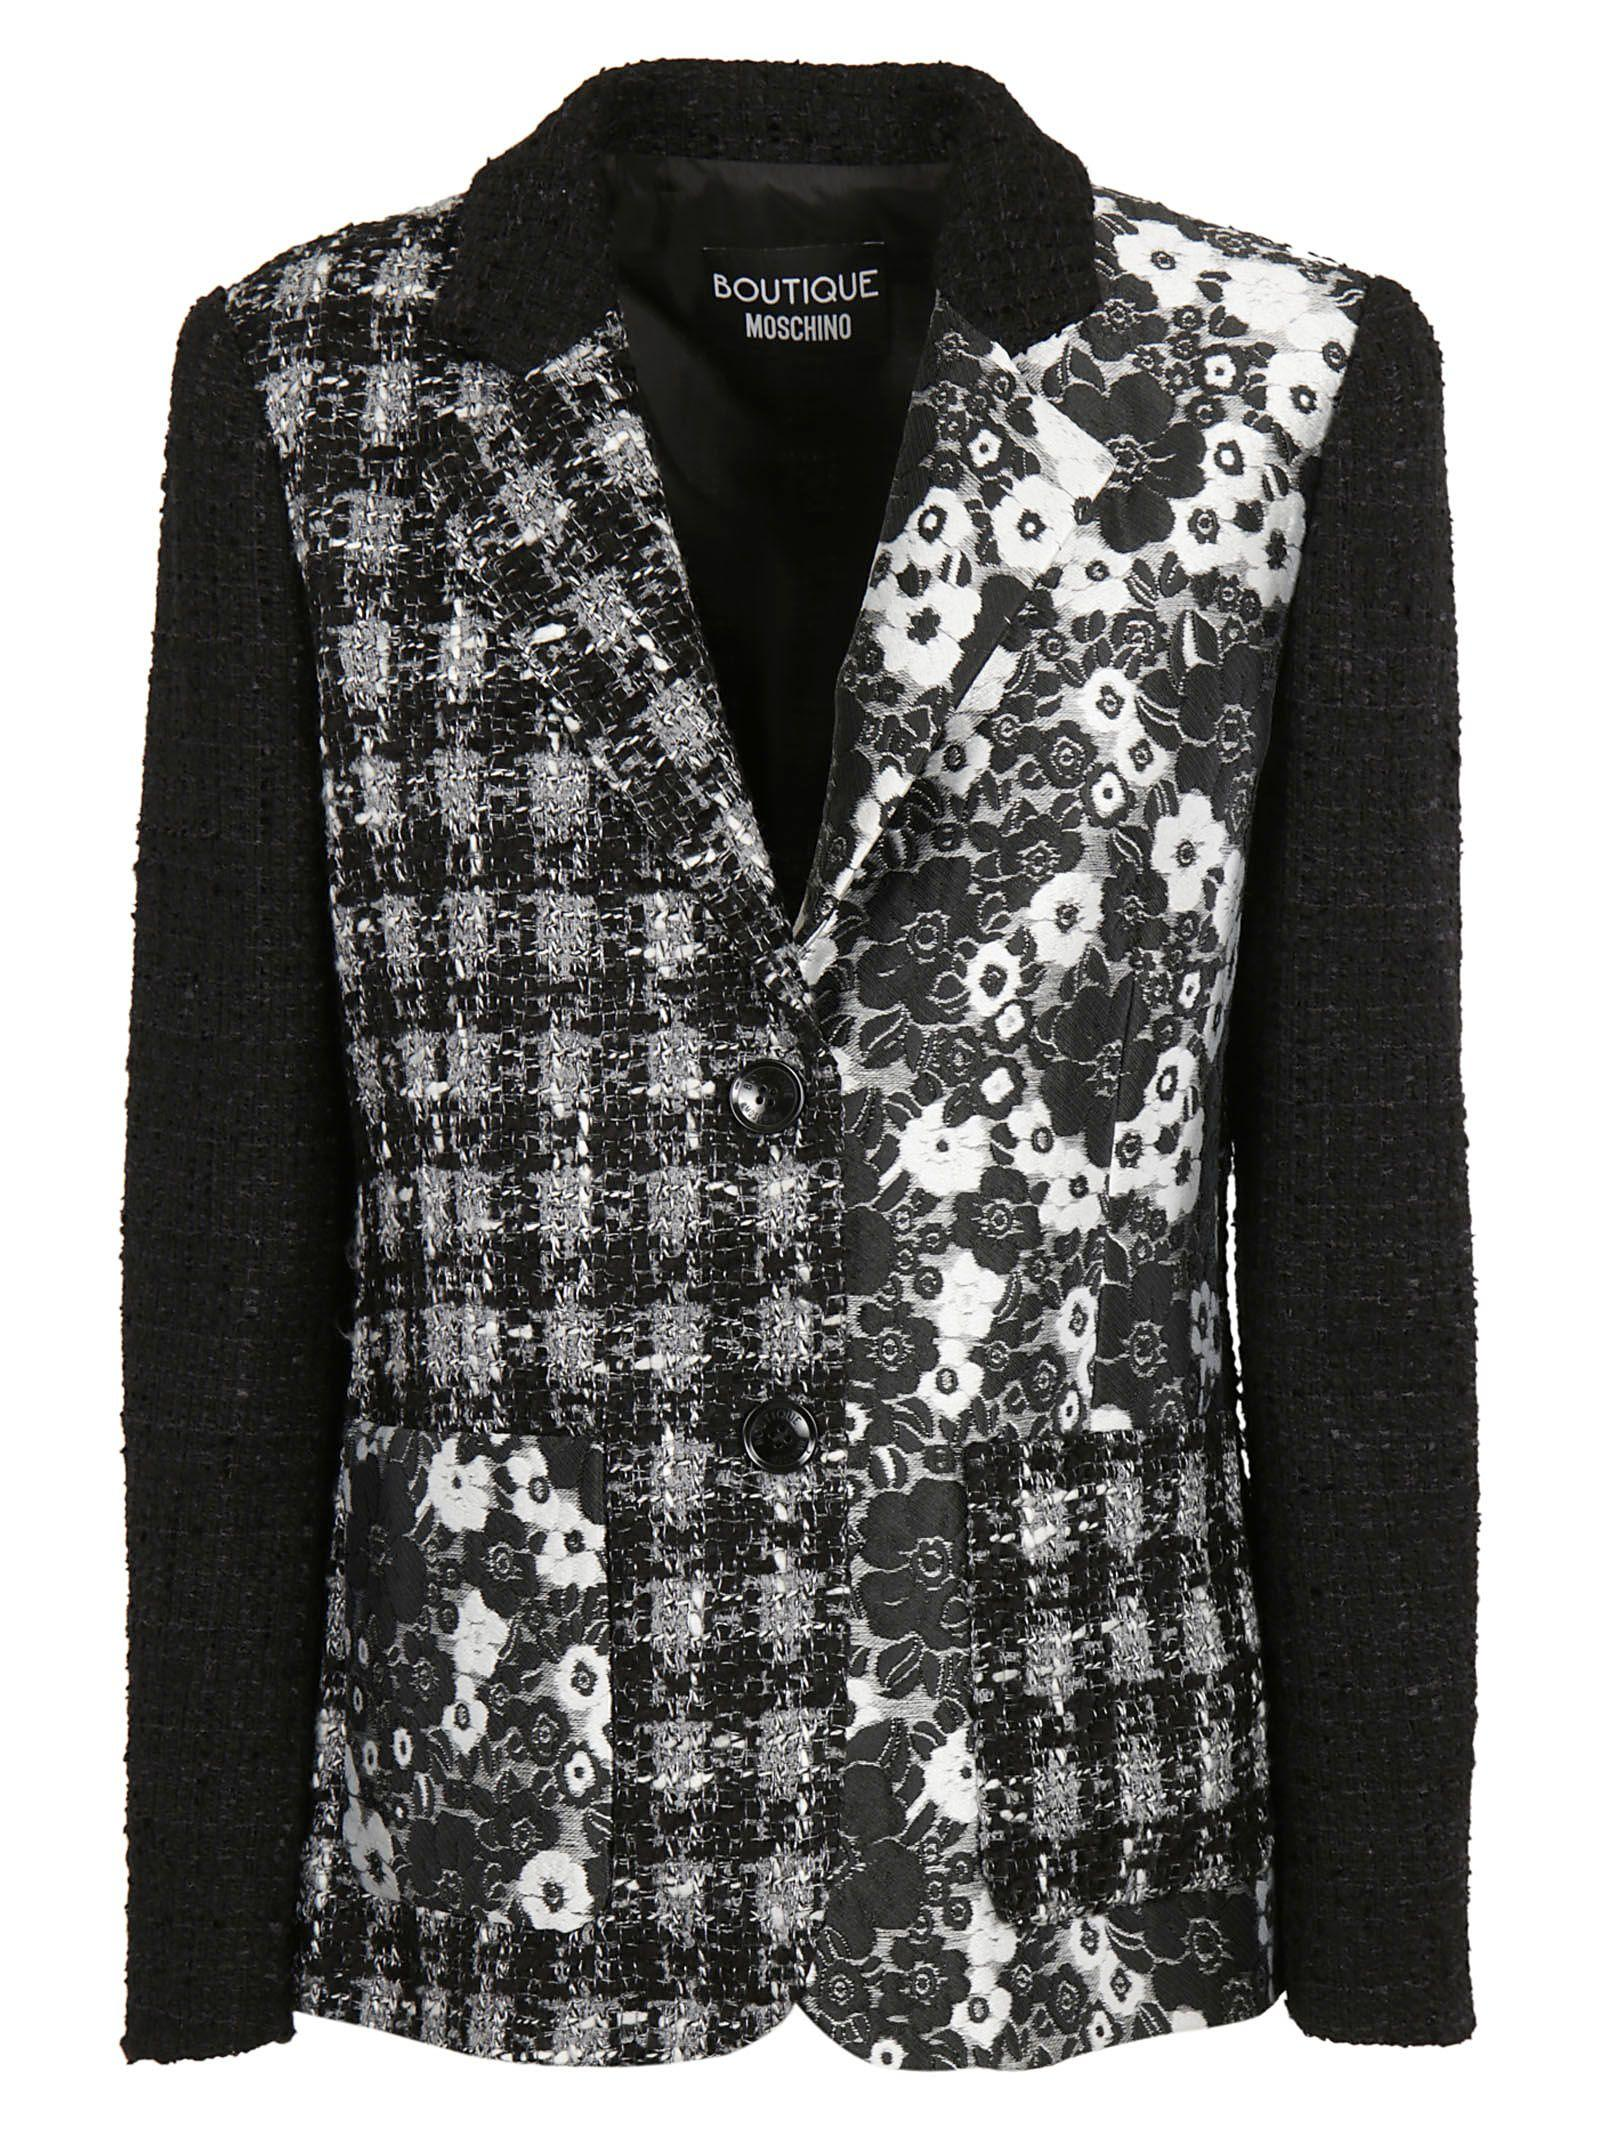 Boutique Moschino Tweed BouclÉ And Brocade Jacket In Black